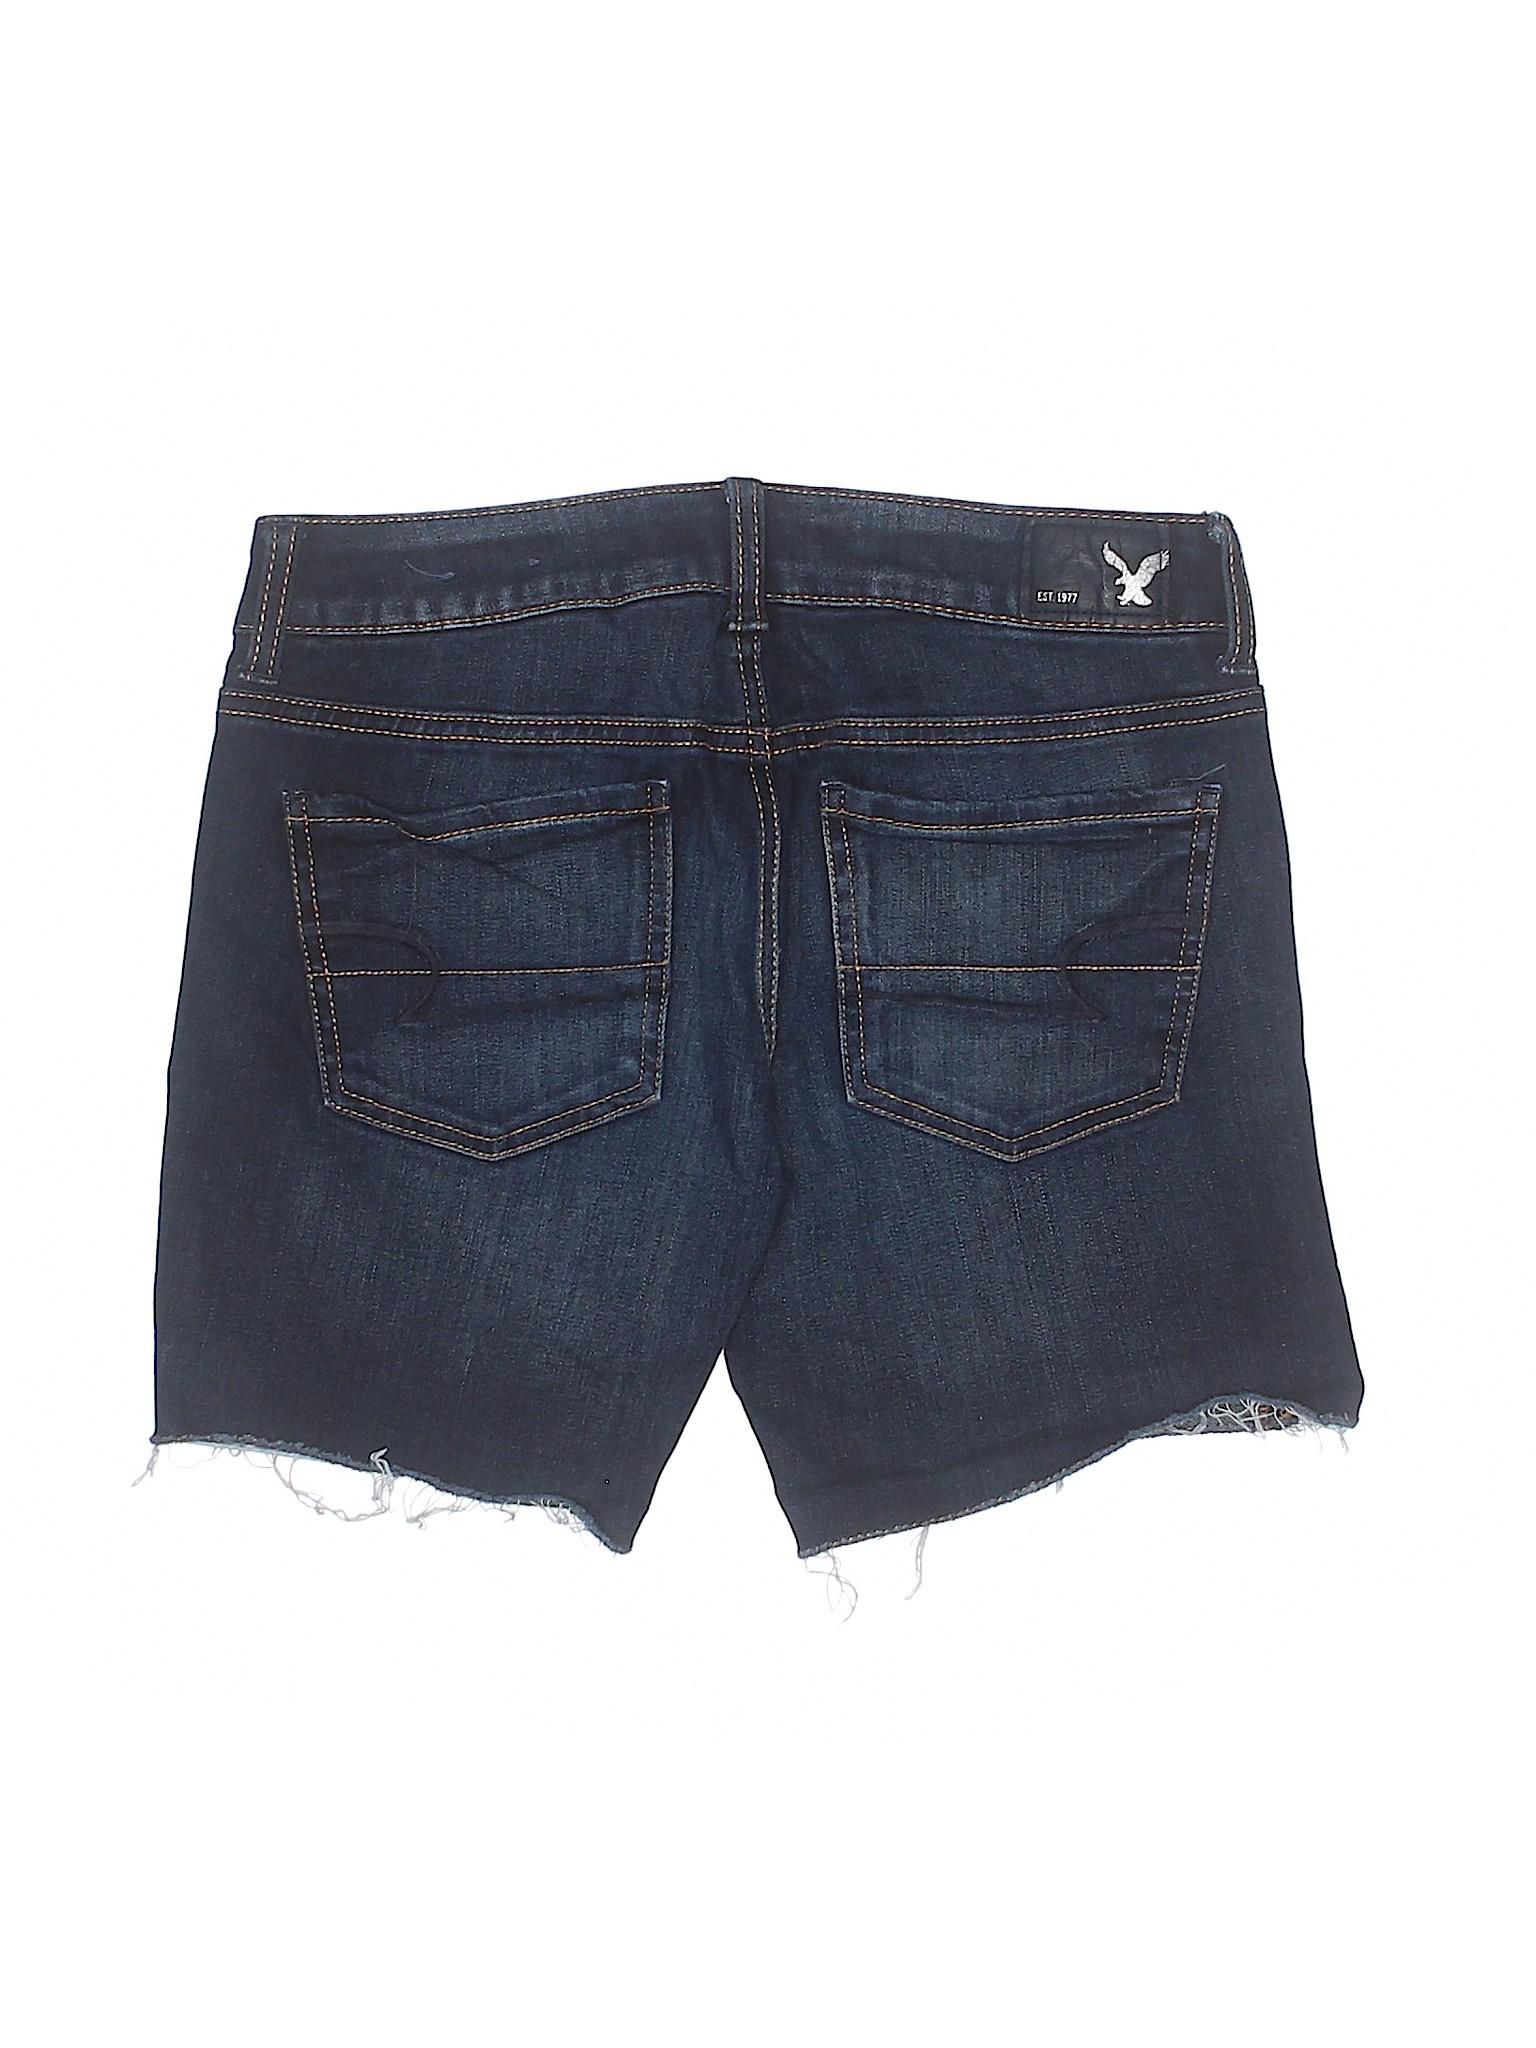 leisure Boutique Outfitters Denim American Eagle Shorts TBdrBqx